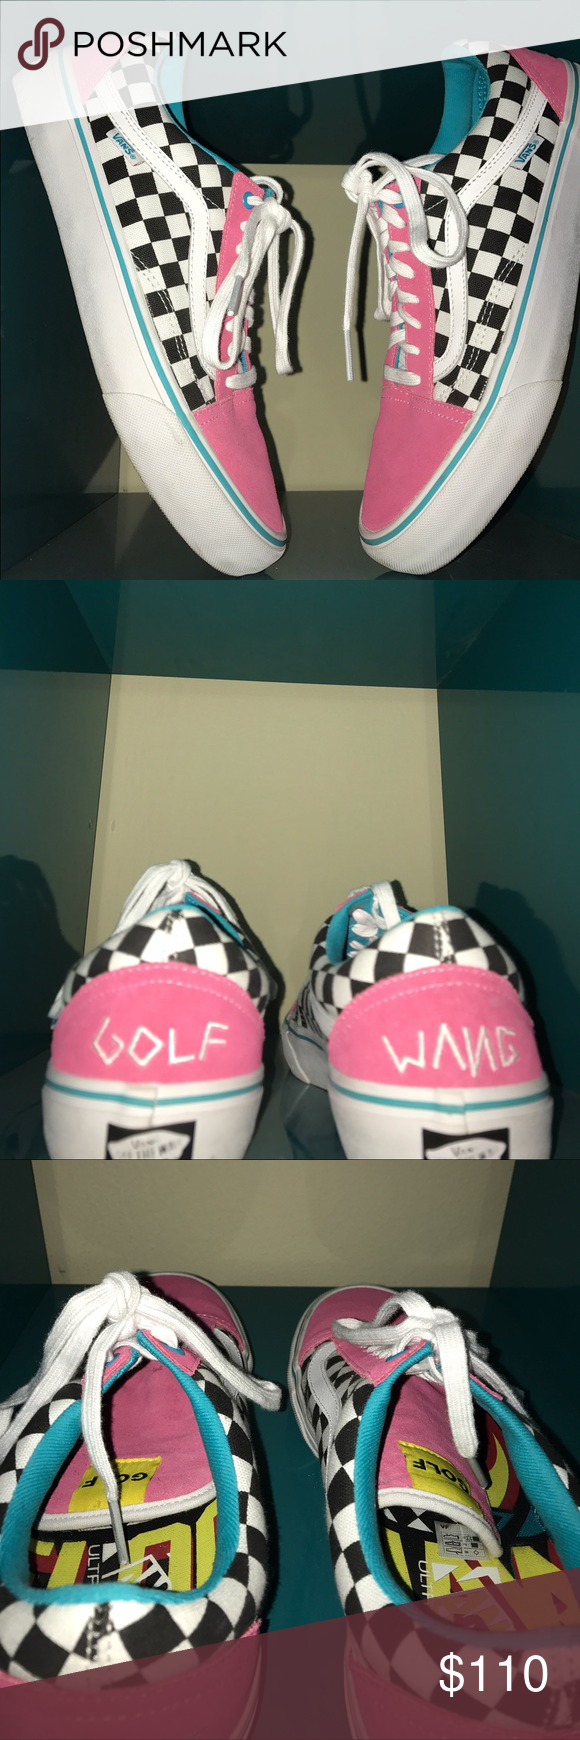 639e6bbc03f0 Golf Wang Vans Golf Wang Vans. 9 10 Condition. Size 11. Vans Shoes ...